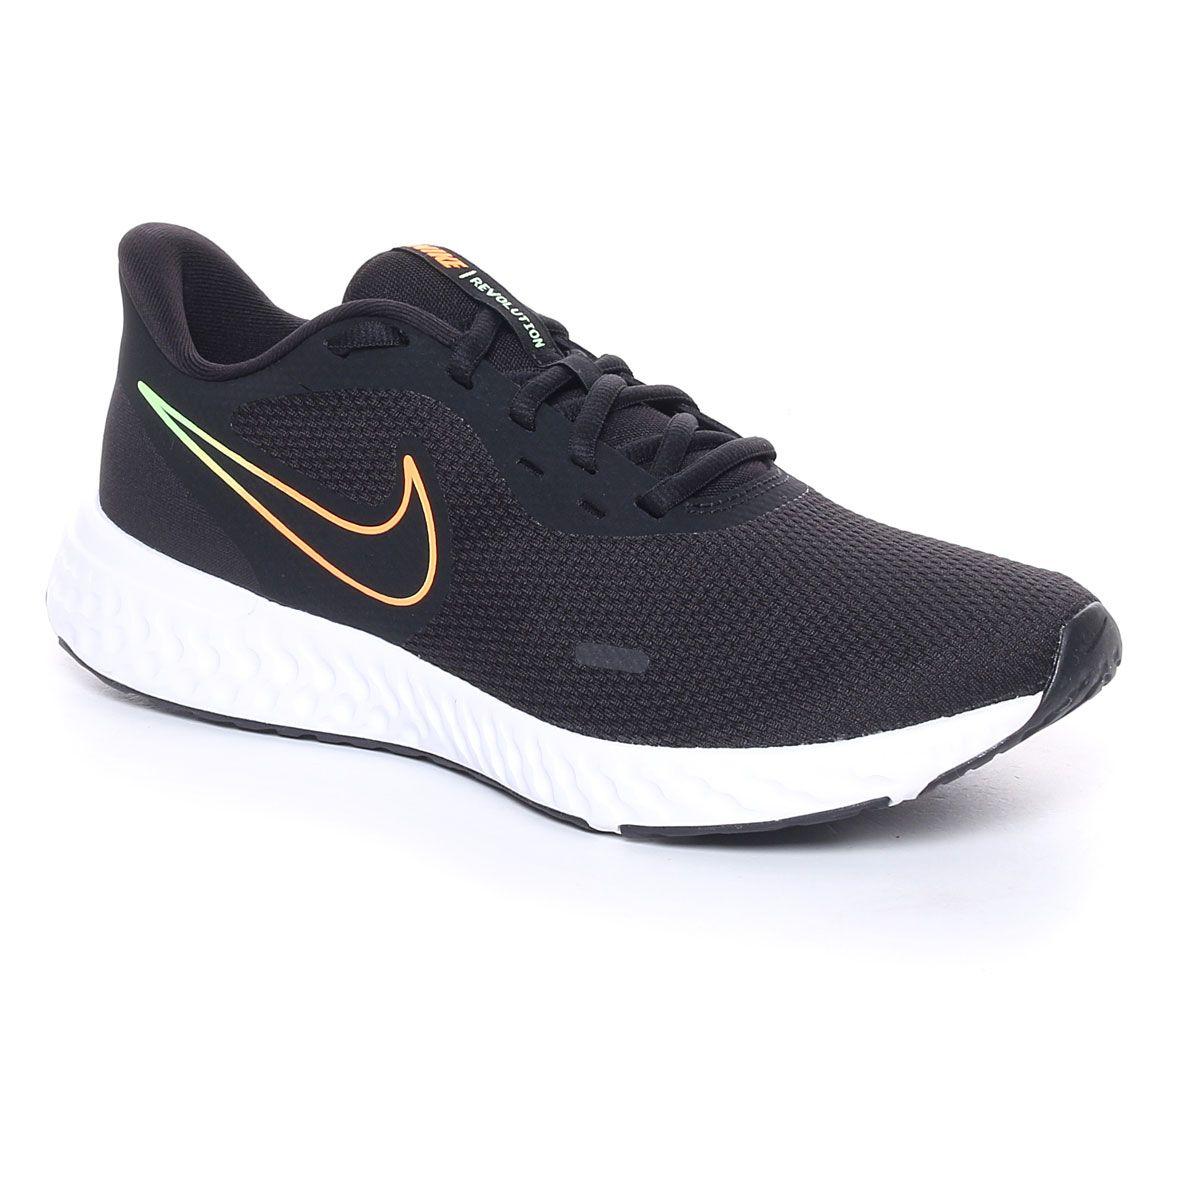 Nike Revolution 5 Uomo Nero Arancione